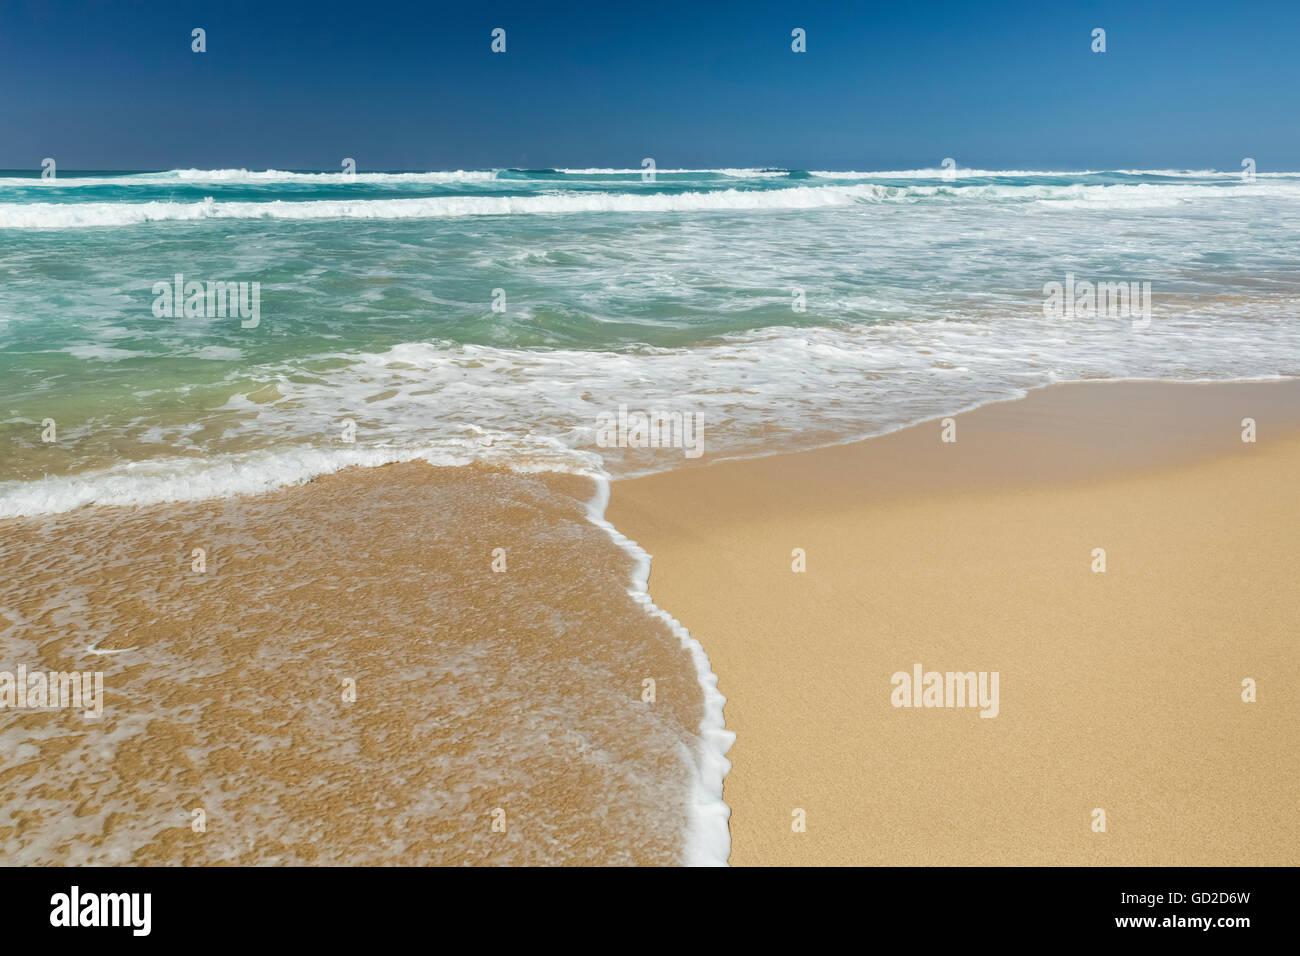 Water washing up on the beach, Barking Sands (Polihale Beach) on West Kauai; Kauai, Hawaii, United States of America Stock Photo